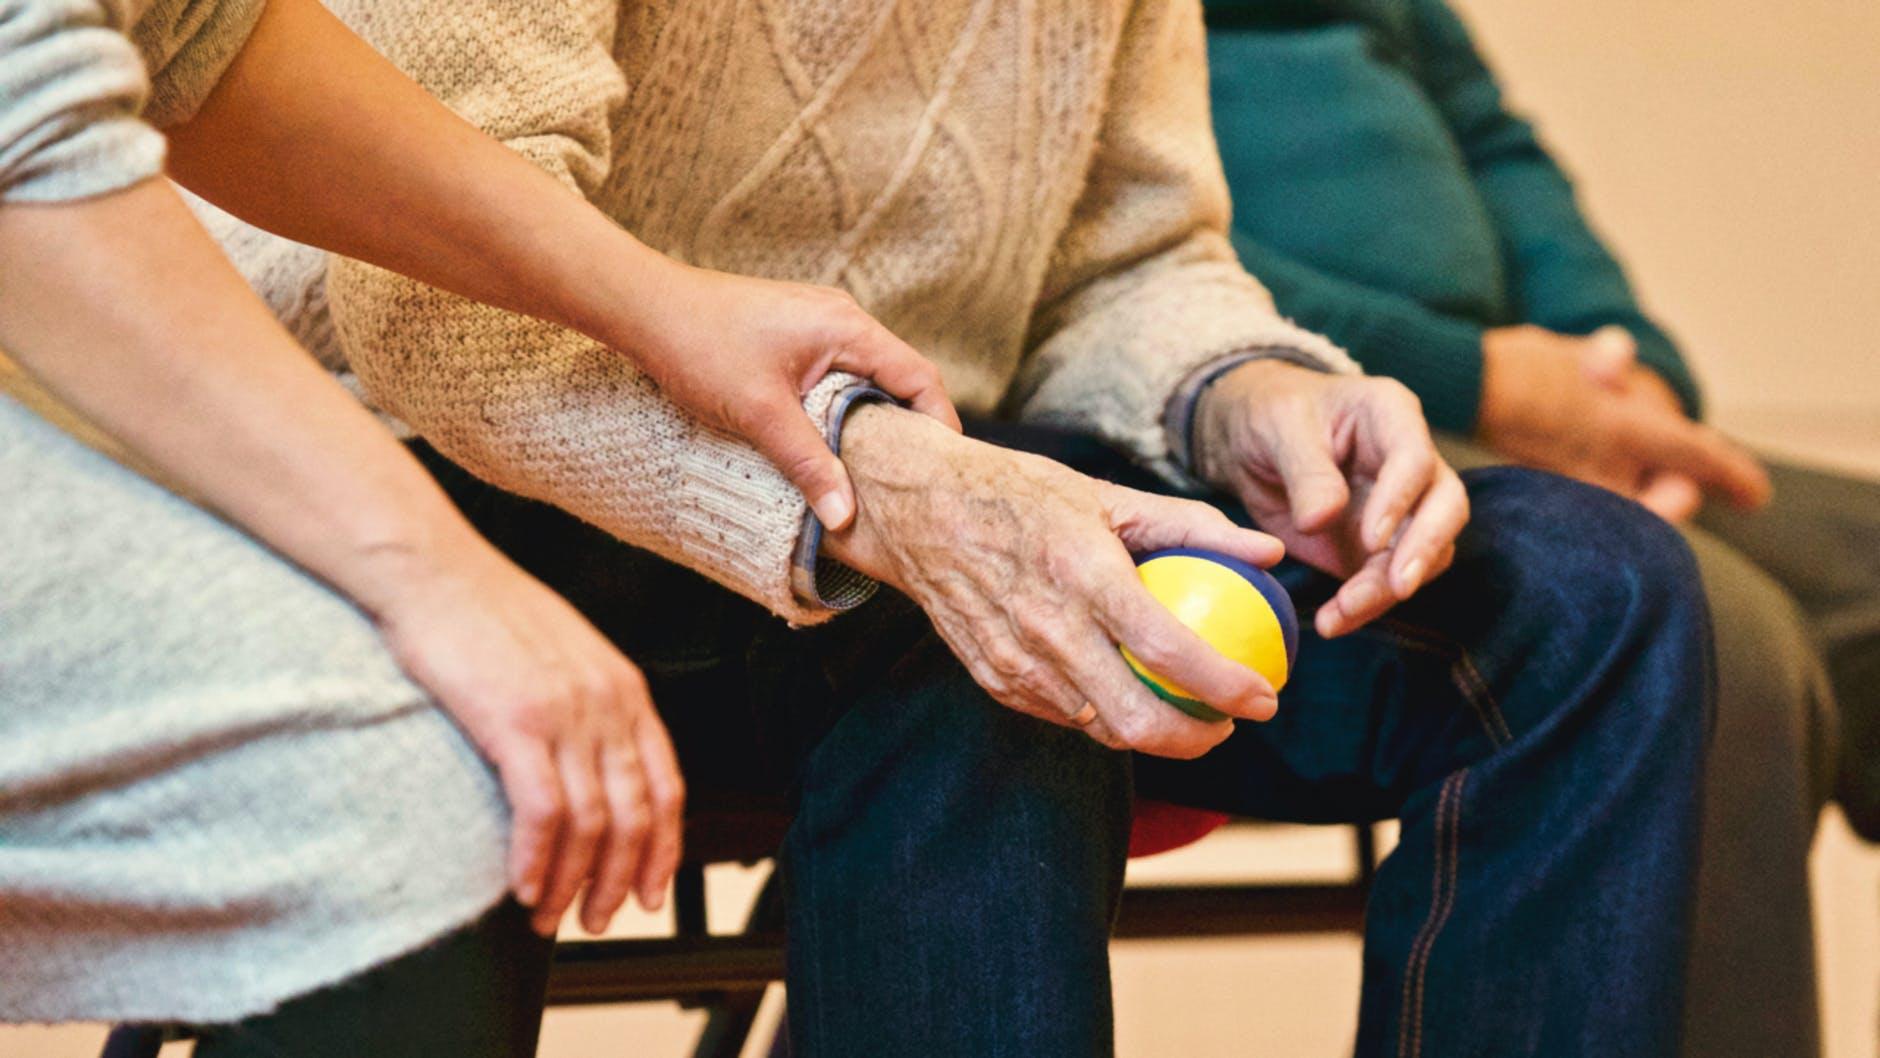 child caring for elderly